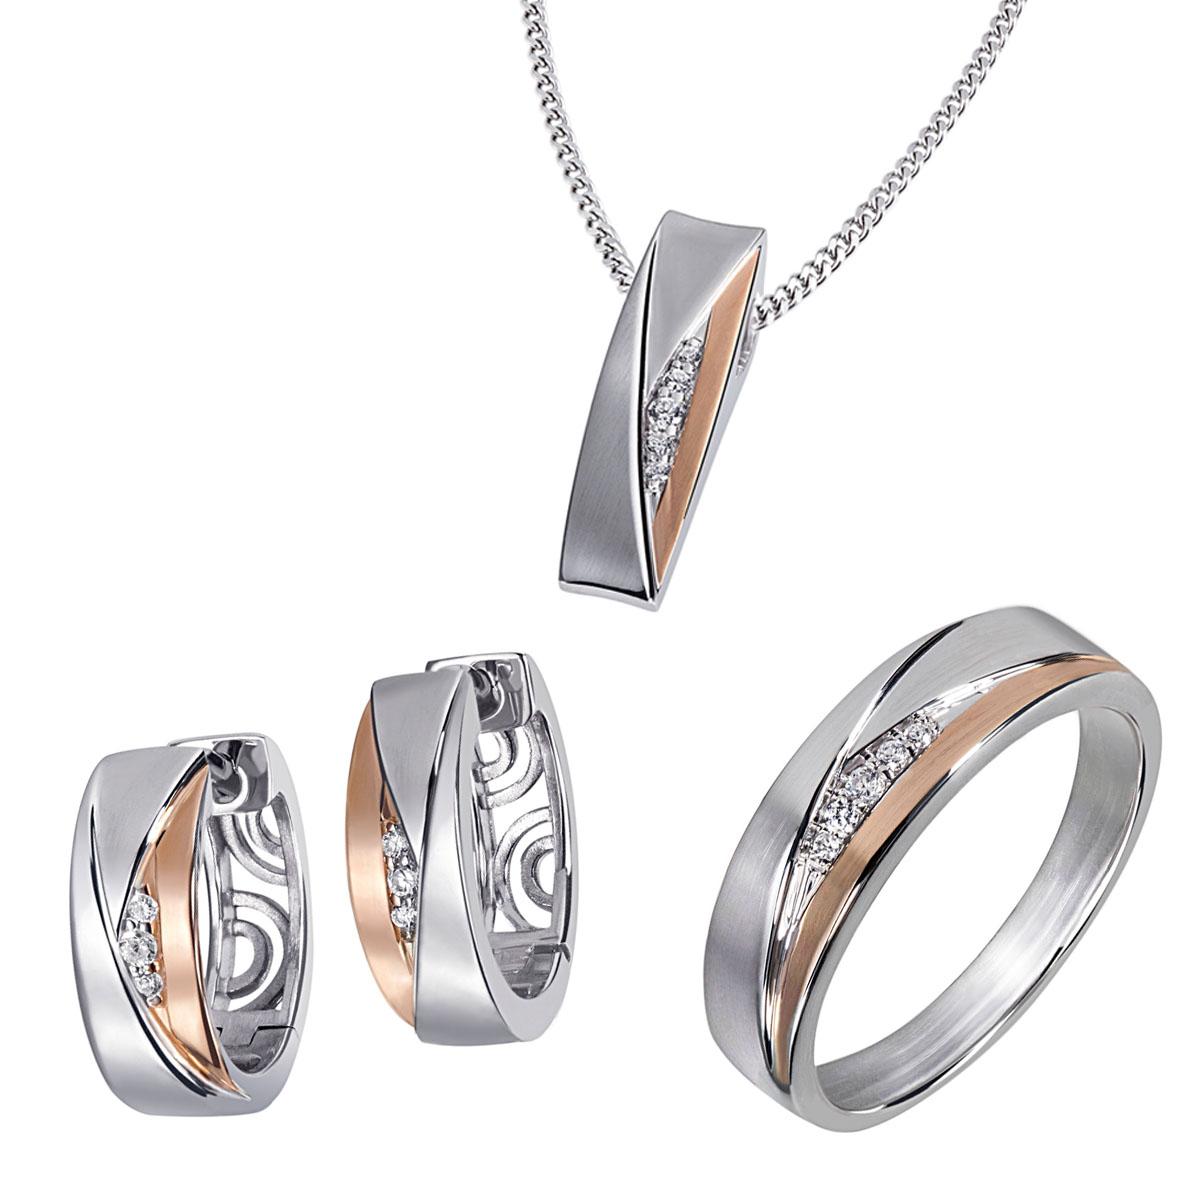 Goldmaid-Damenring-Collier-oder-Creolen-Sterlingsilber-925-mit-Zirkonia